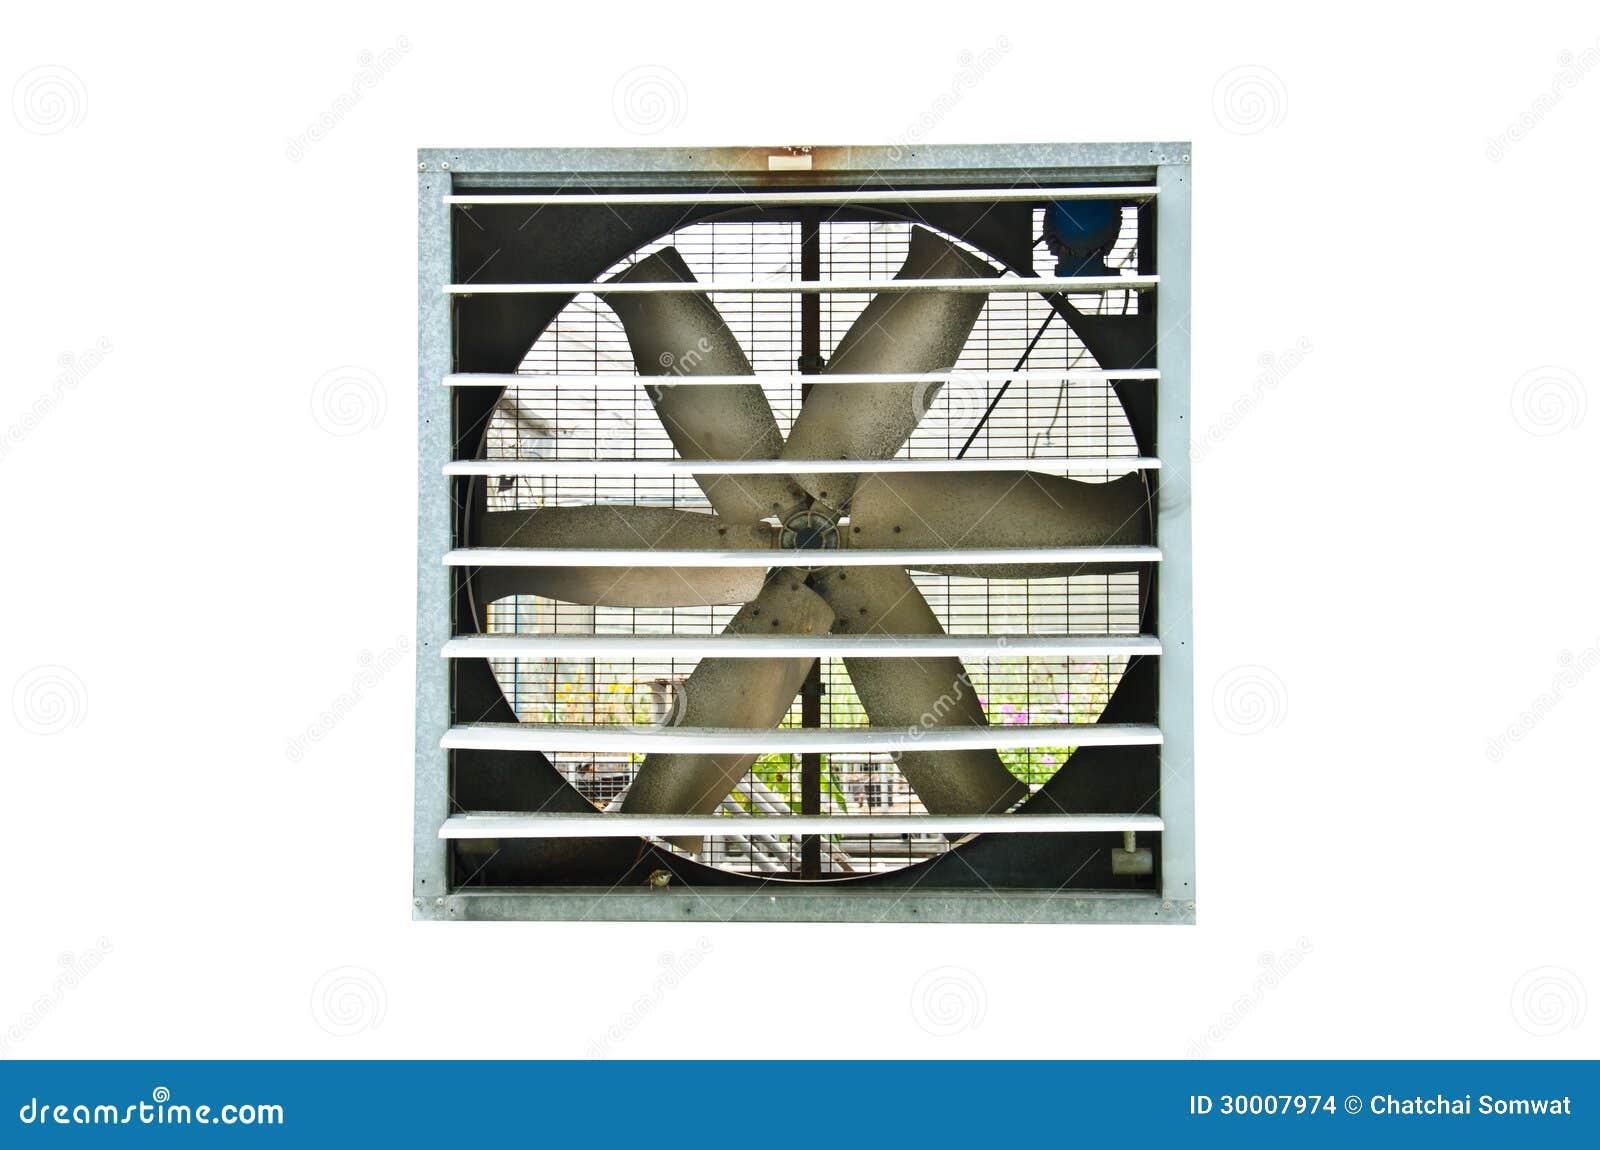 Industrial ventilator fan on white background. #83A229